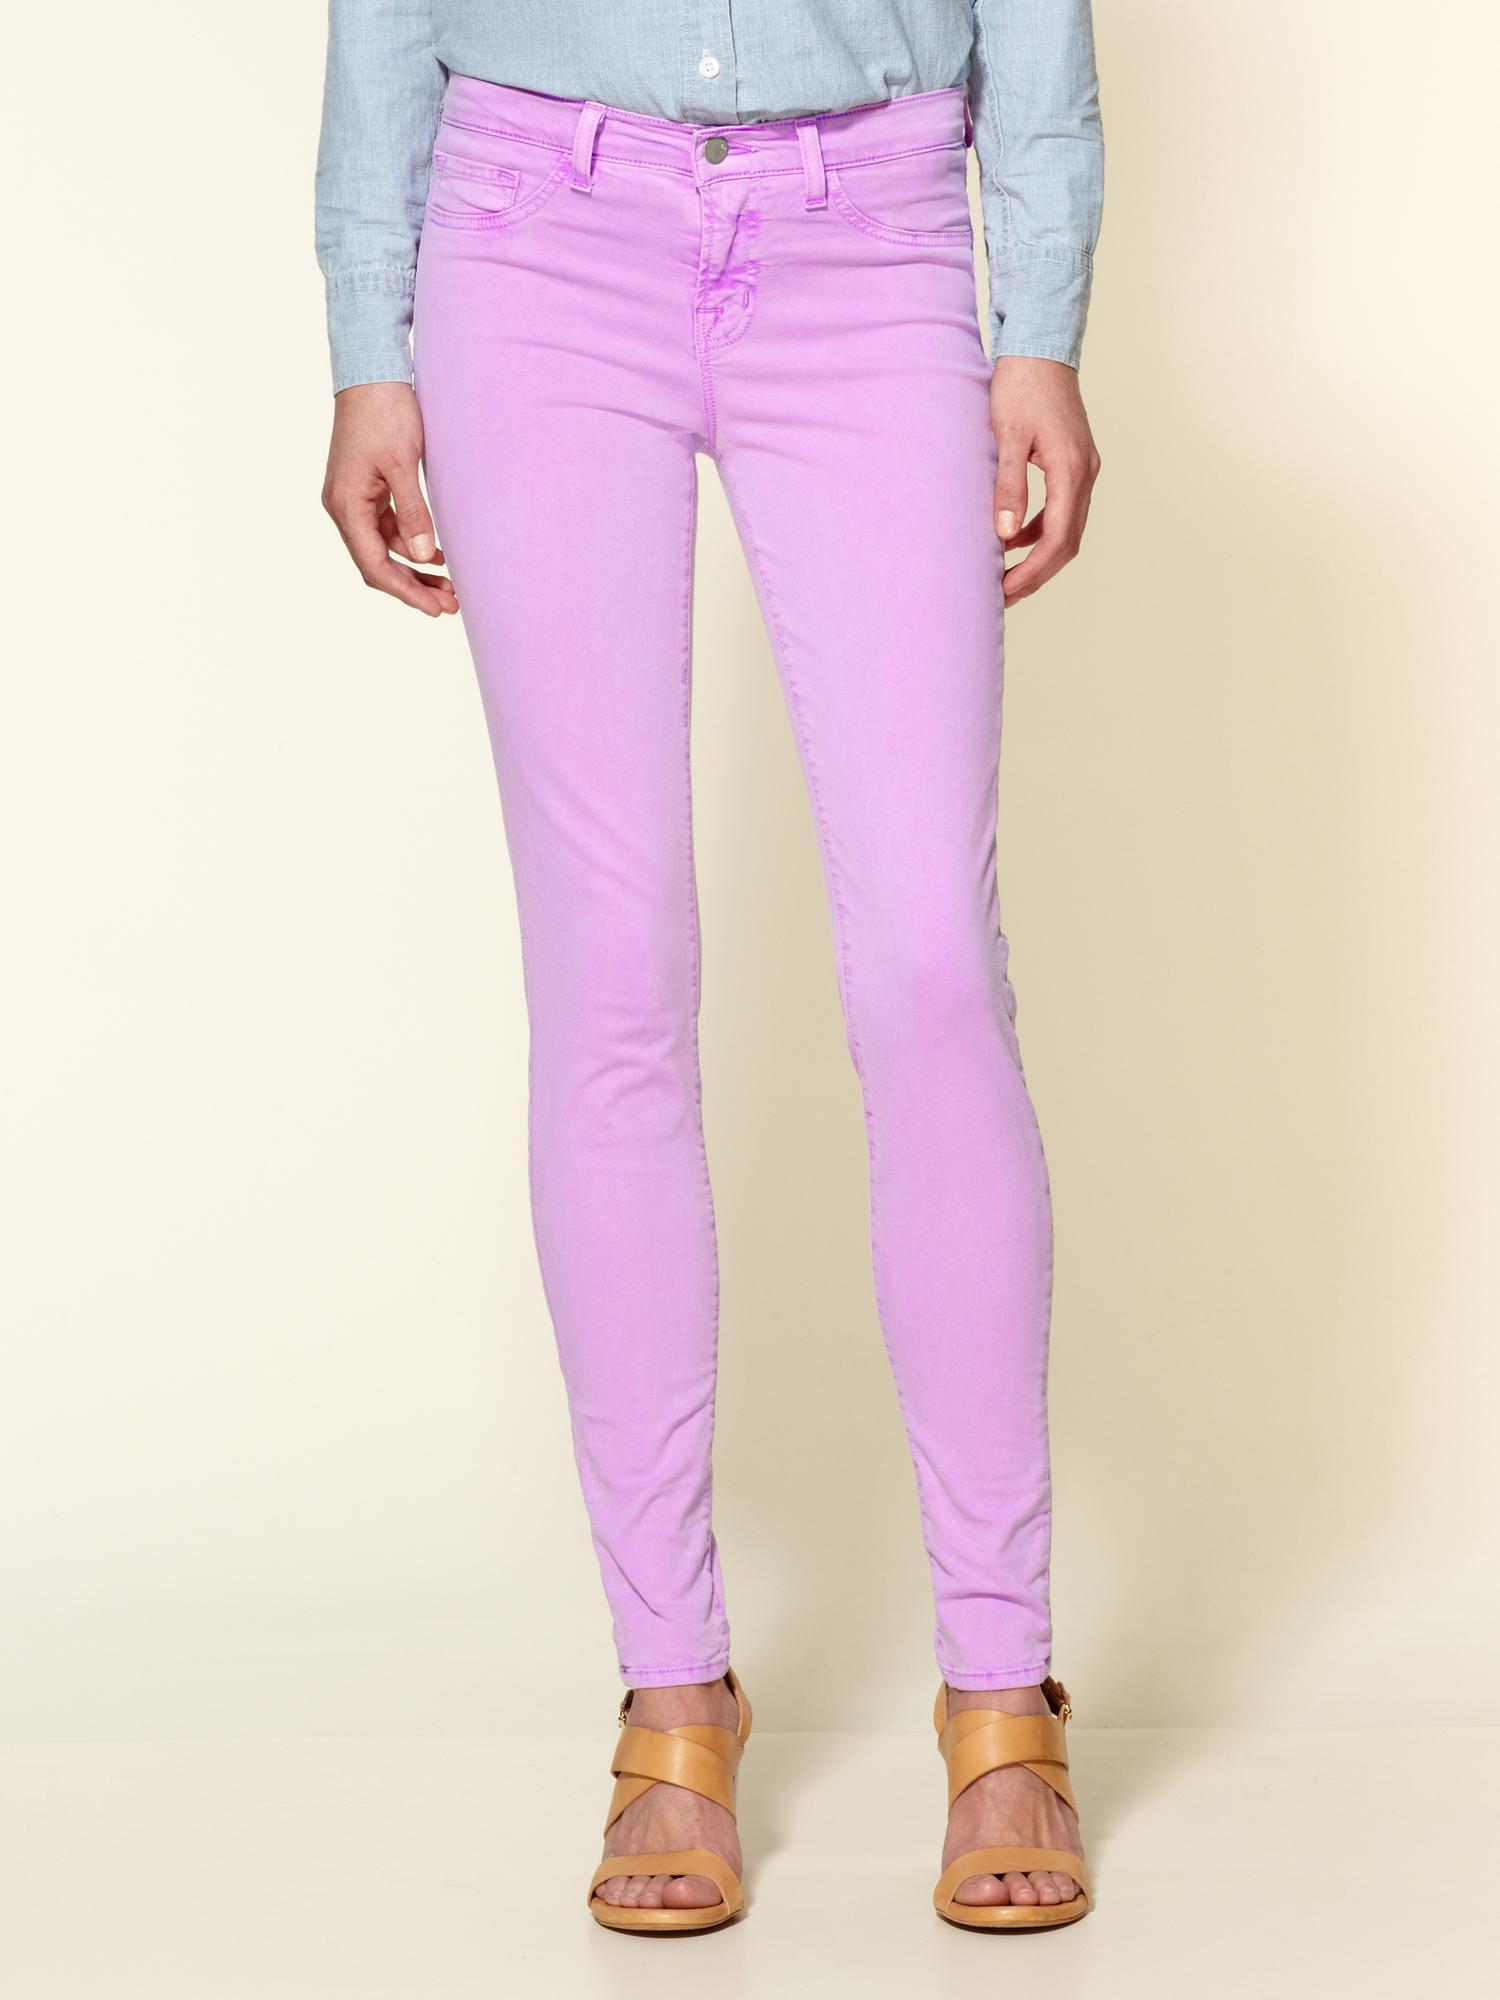 j brand 811 mid rise skinny jeans in purple neon purple. Black Bedroom Furniture Sets. Home Design Ideas